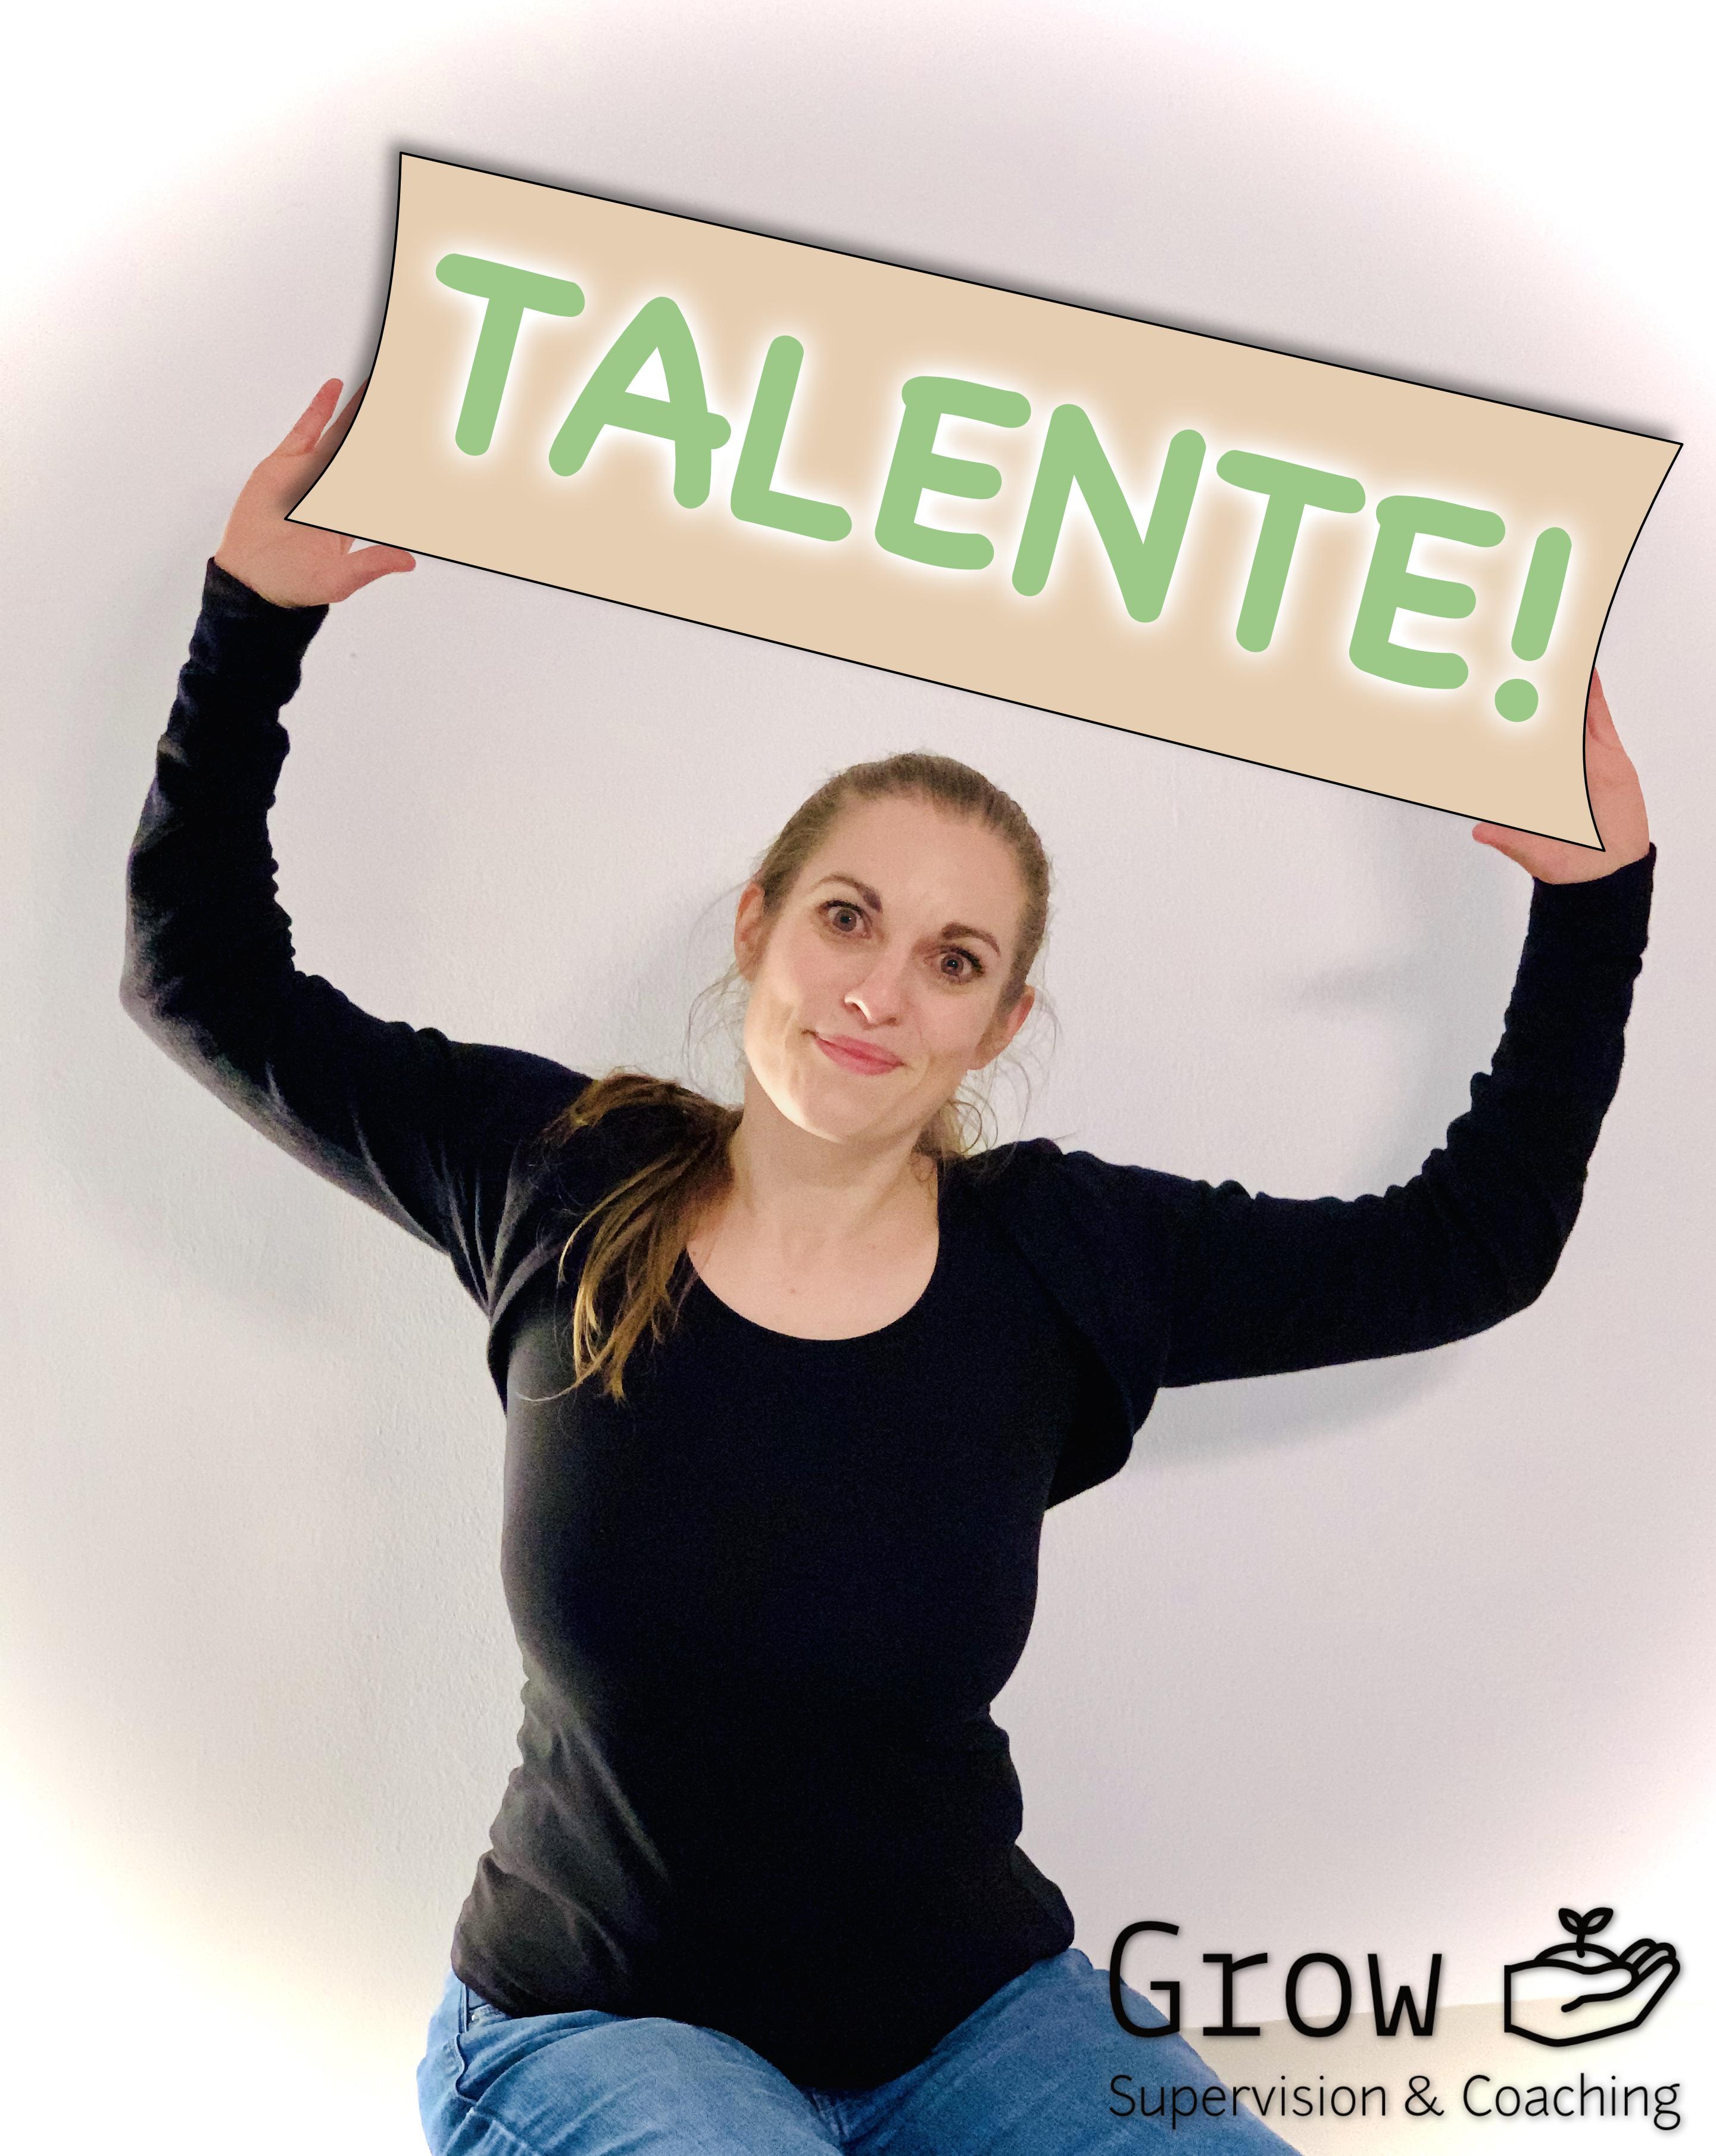 Talente!